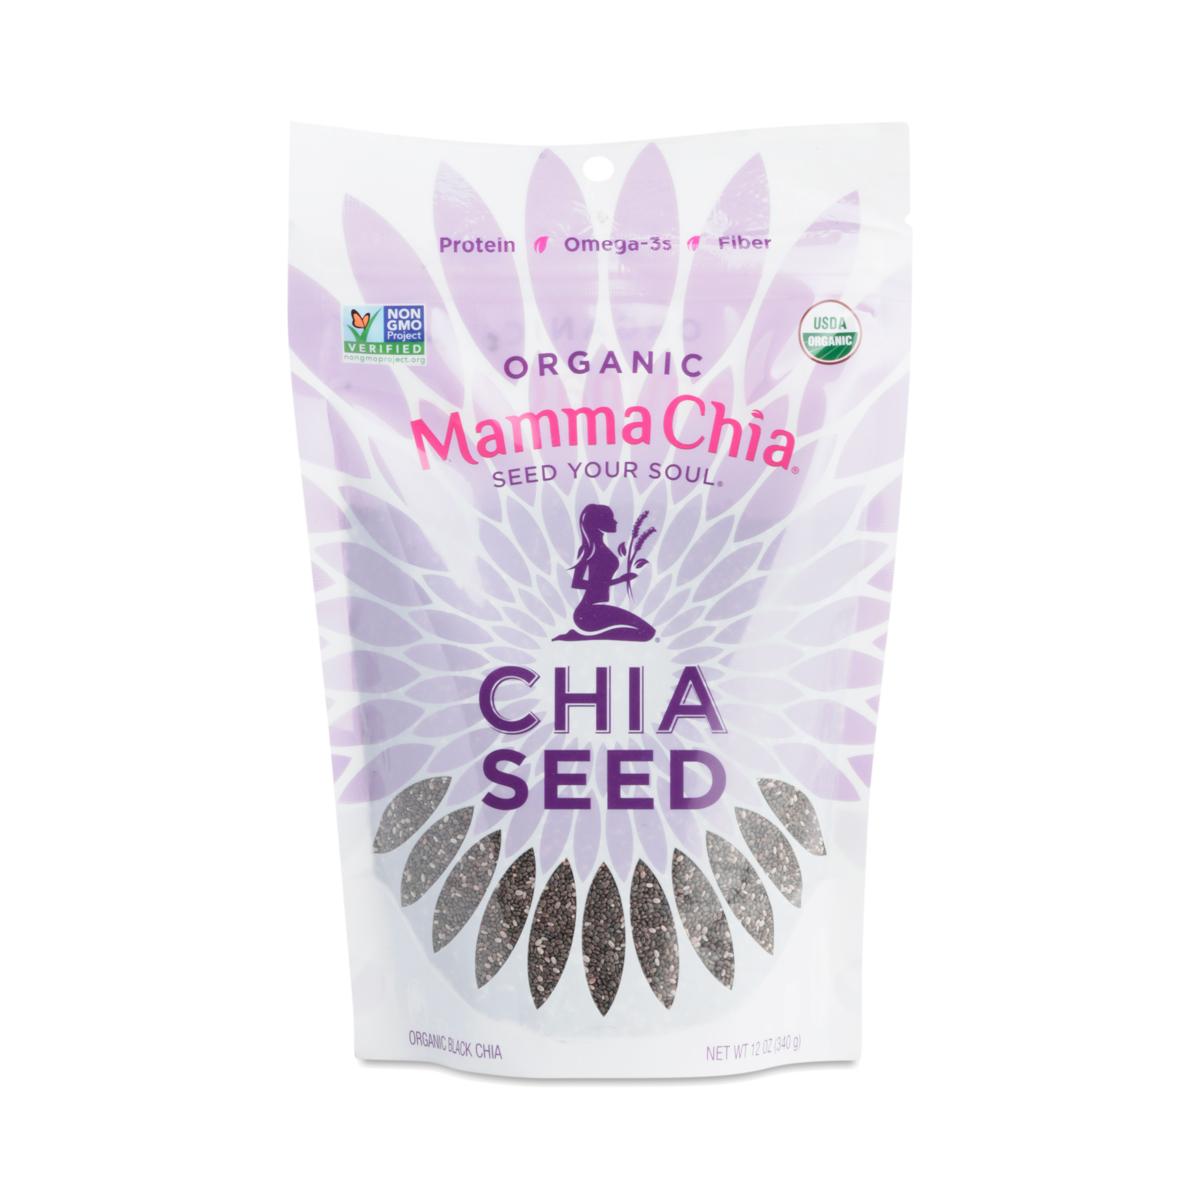 Mamma Chia Organic Black Chia Seeds 12 oz pouch